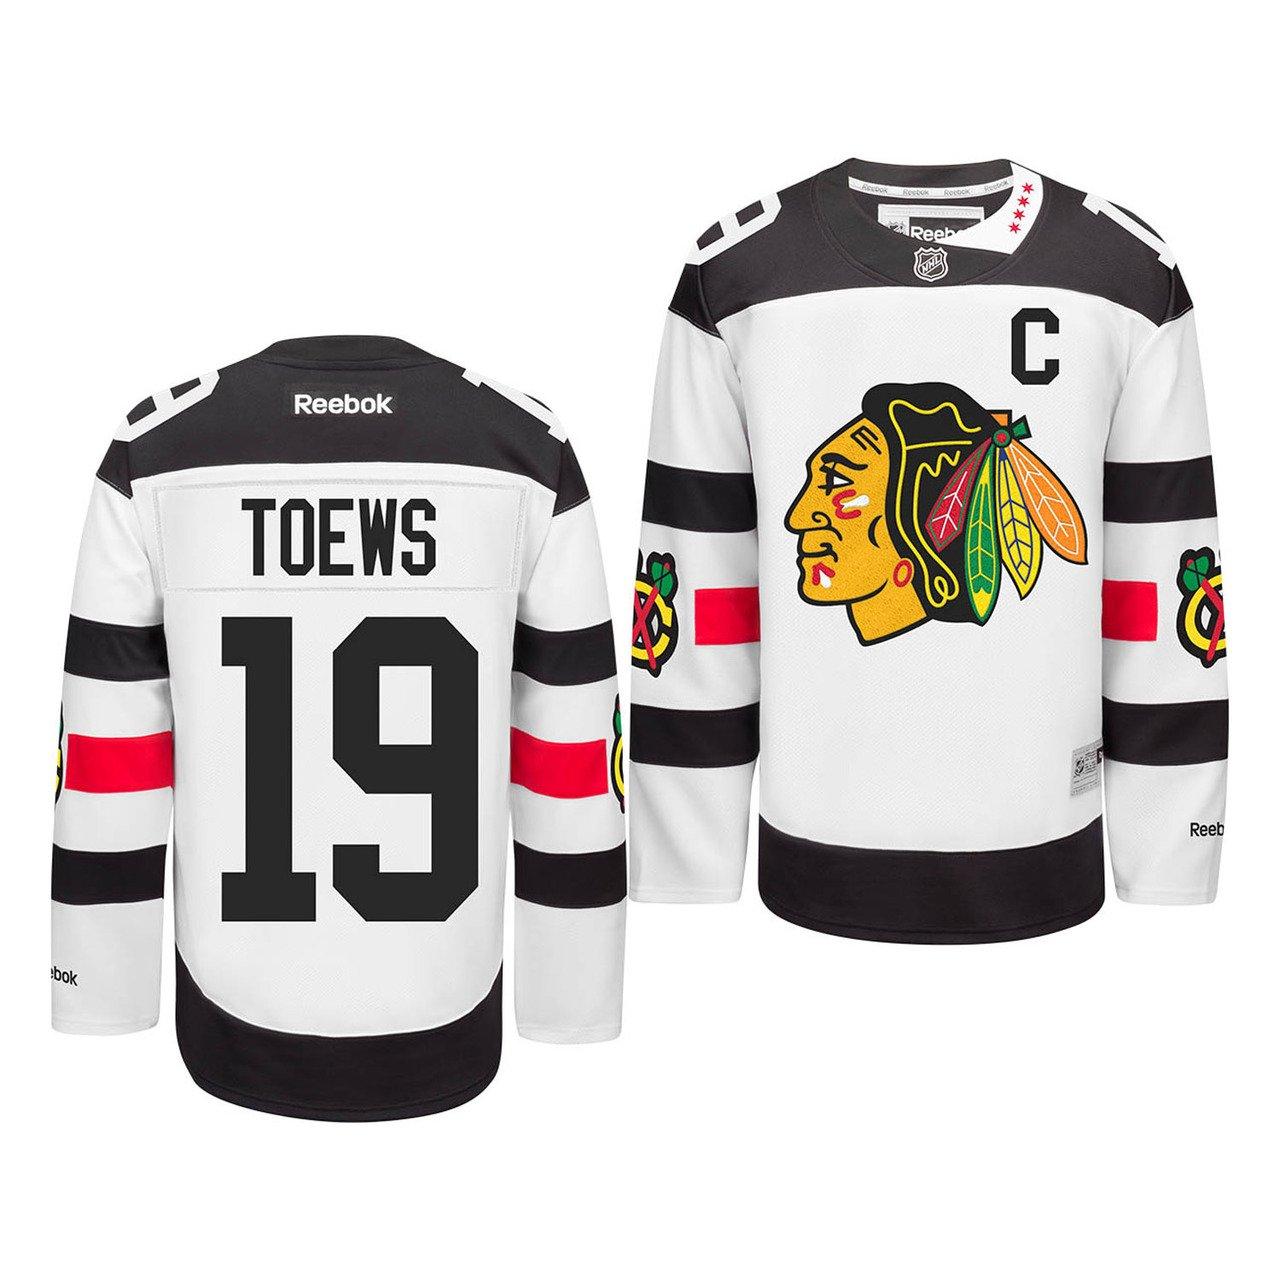 b3004c083 closeout jonathan toews chicago blackhawks 2016 stadium series premier  jersey by reebok hot sale dbfeb 8b8d4